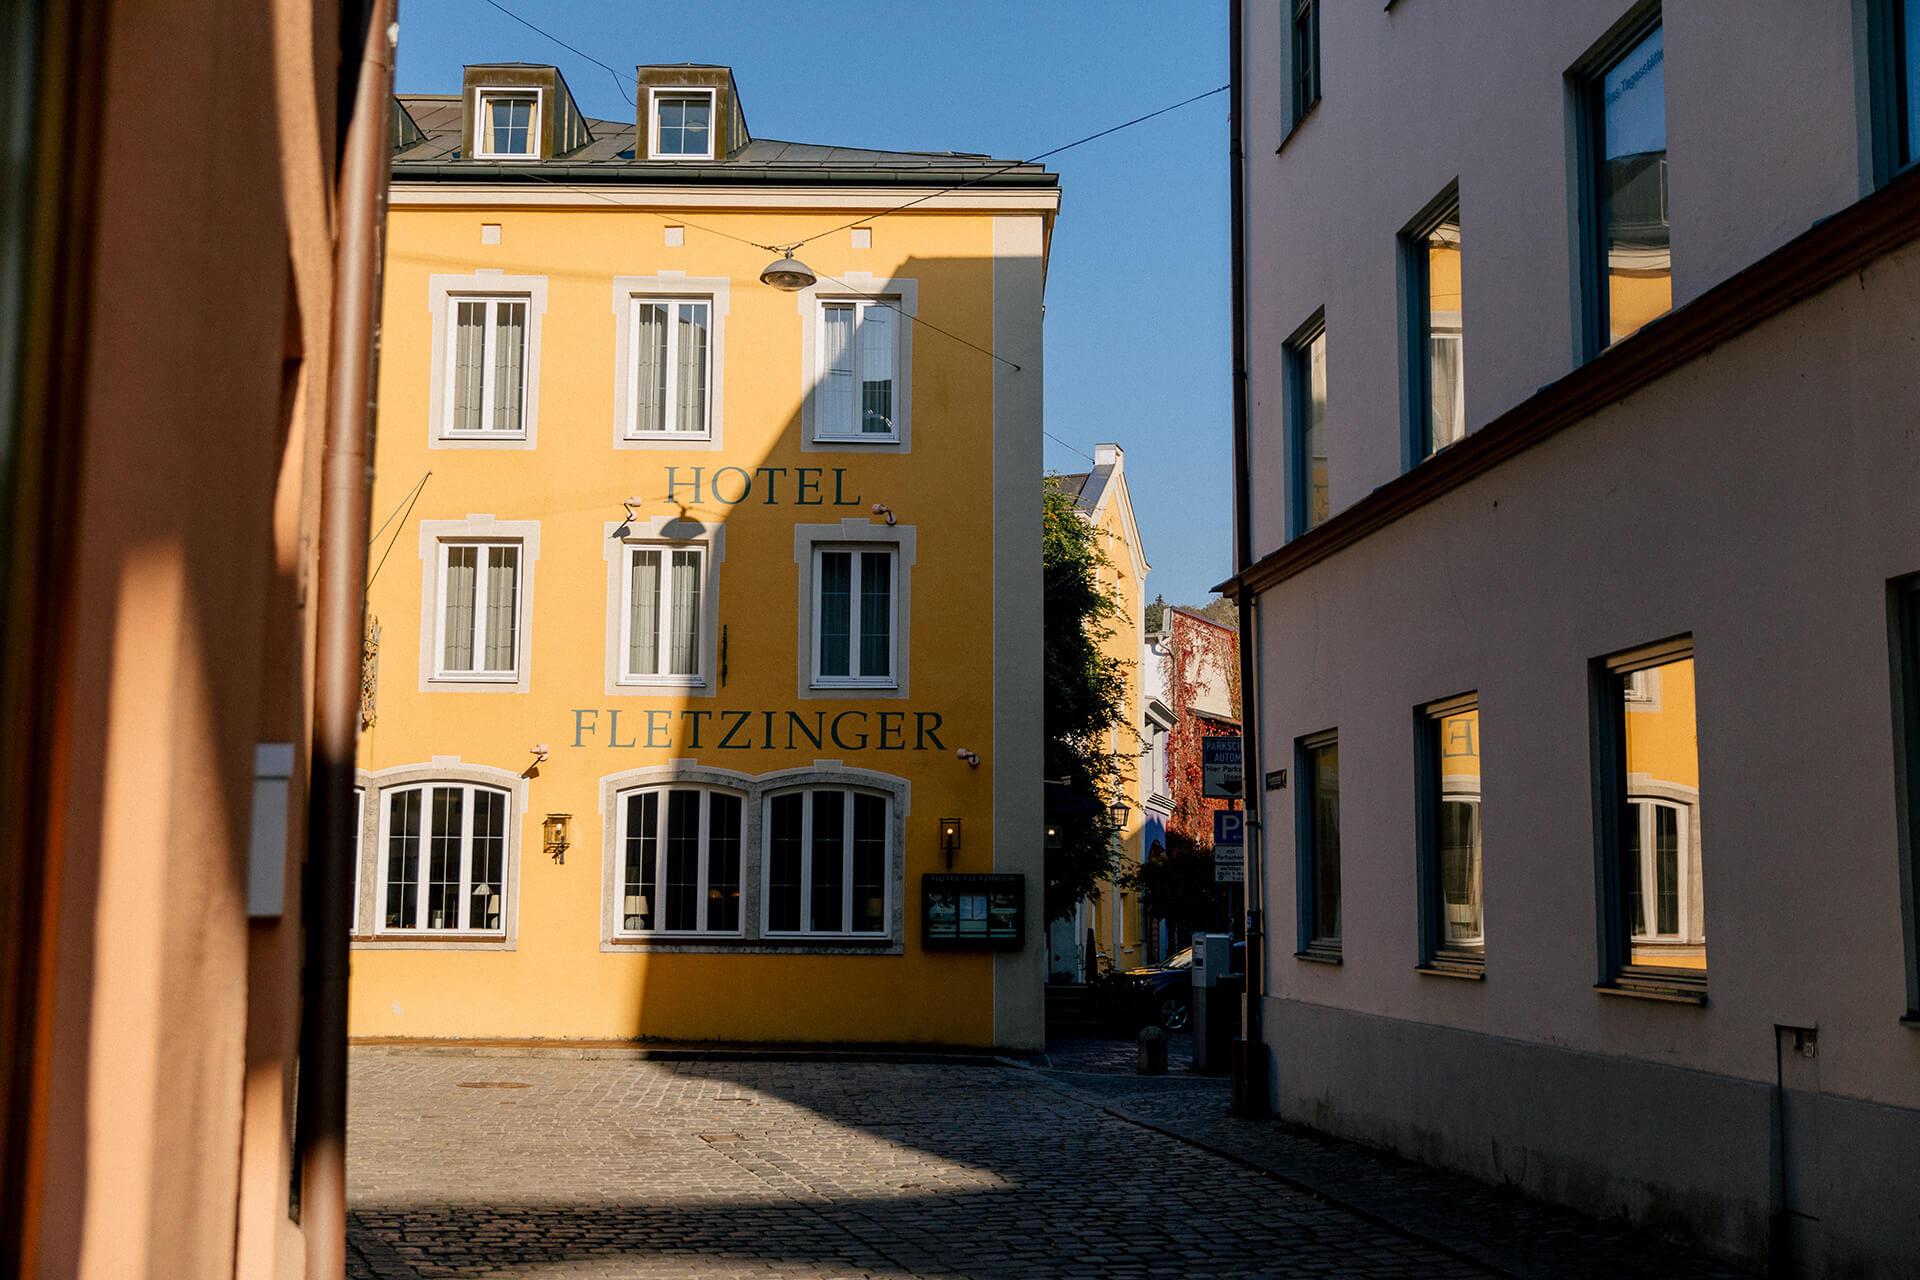 Hotel Fletzinger Altstadt Wasserburg